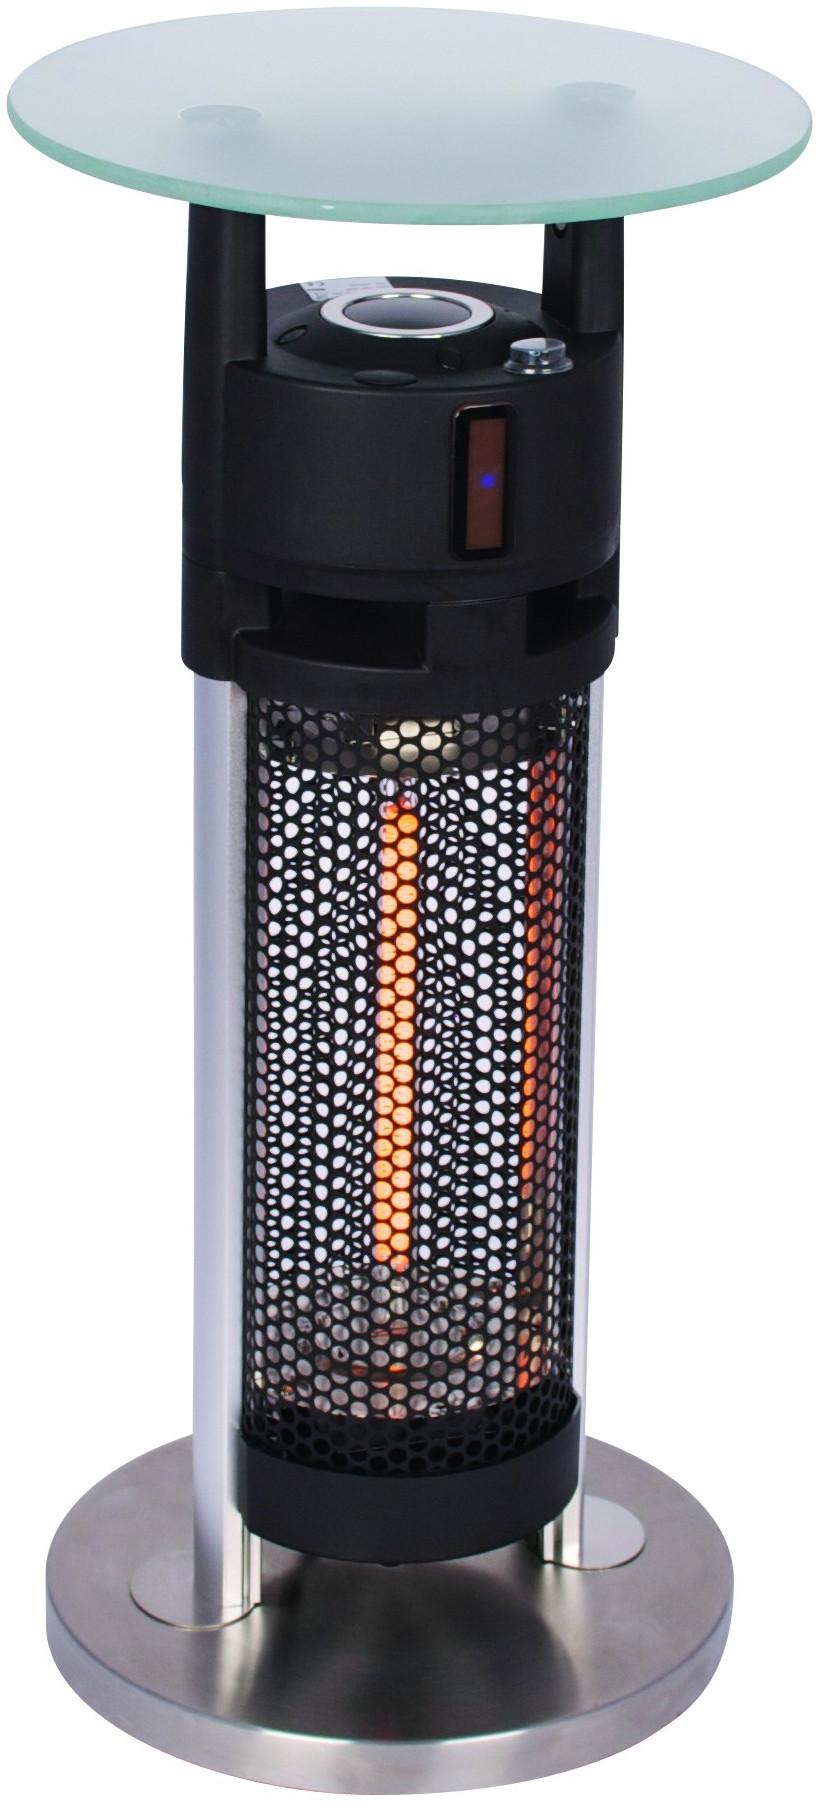 Tegelverf In De Badkamer ~ Badkamer Verwarming Elektrisch Gamma Drl tekno recht badkamer design